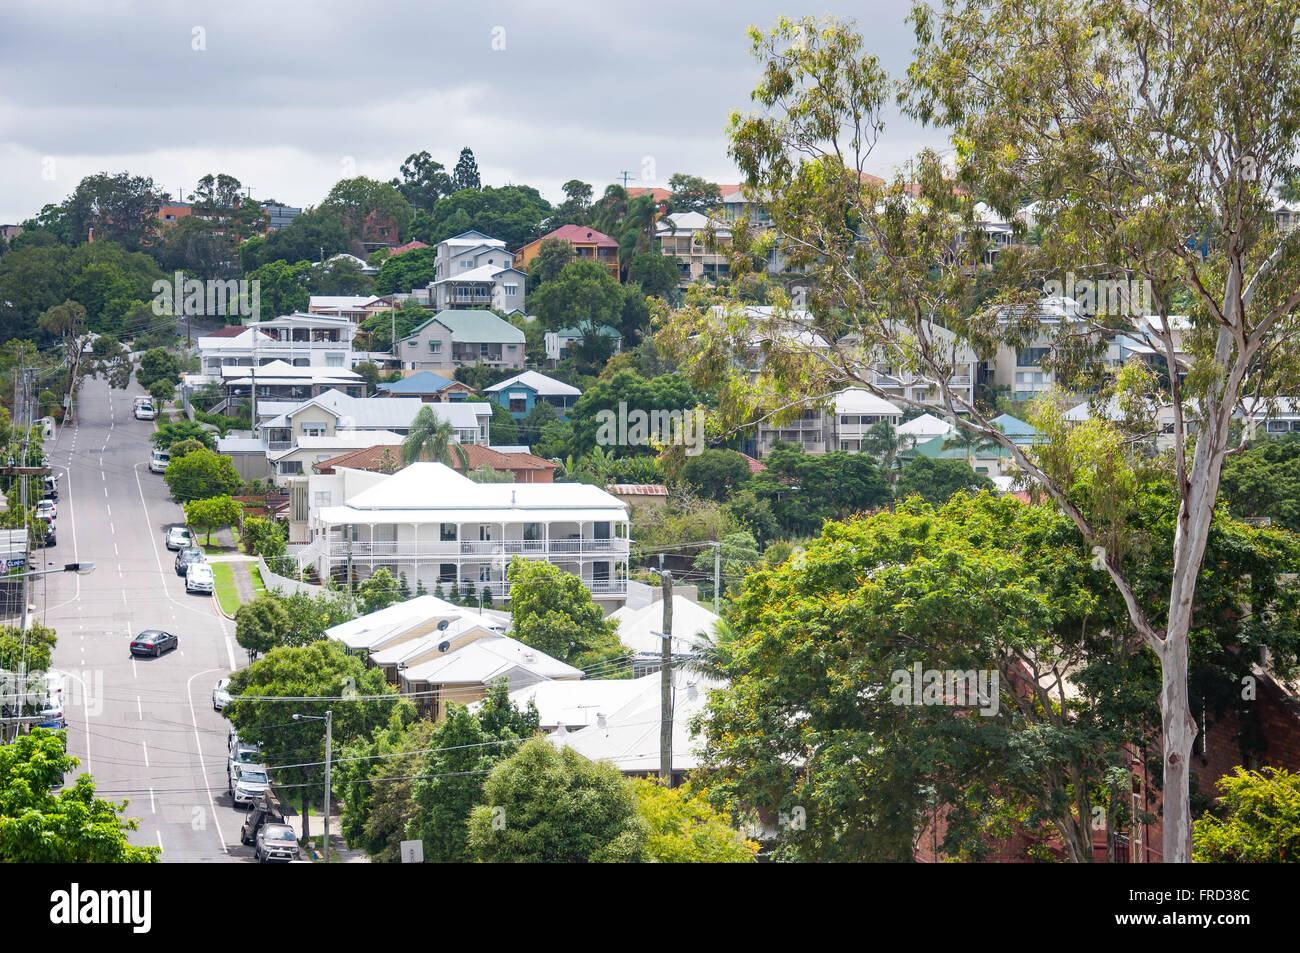 Houses on Great George Street in suburb of Paddington, Brisbane, Queensland, Australia - Stock Image